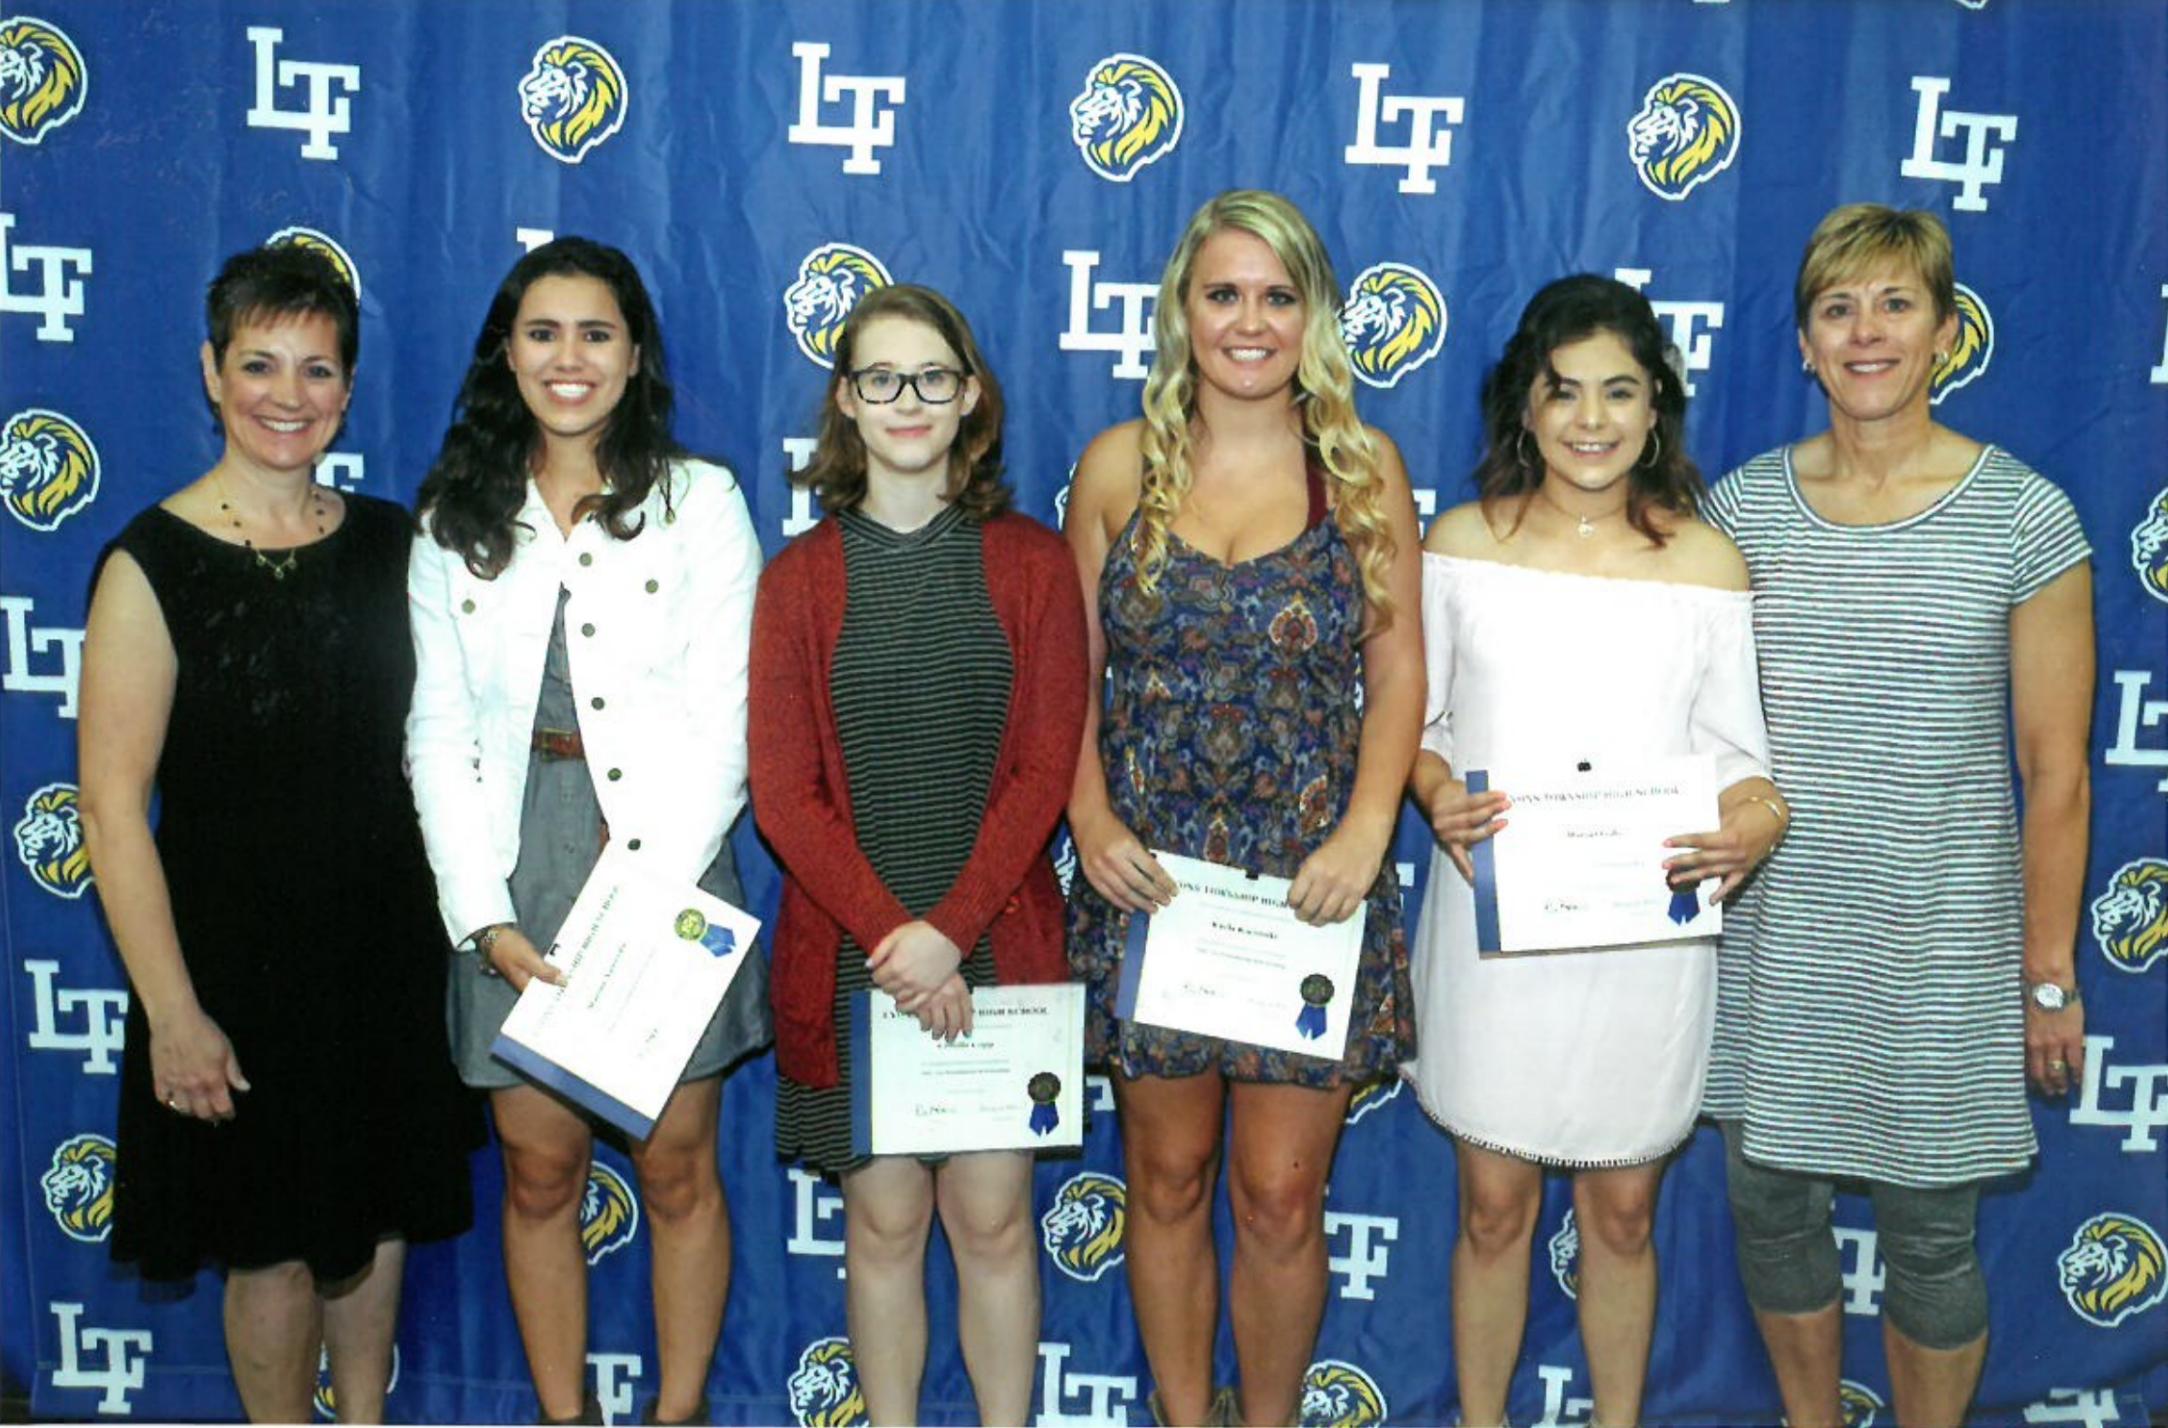 2017 Scholarship Awardees - Pictured (L to R): Mrs. Susan Dixon, Marina Auwerda, Camille Copp, Kayla Kocimski, Maria Ojeda,Ms. Louise Kulaga